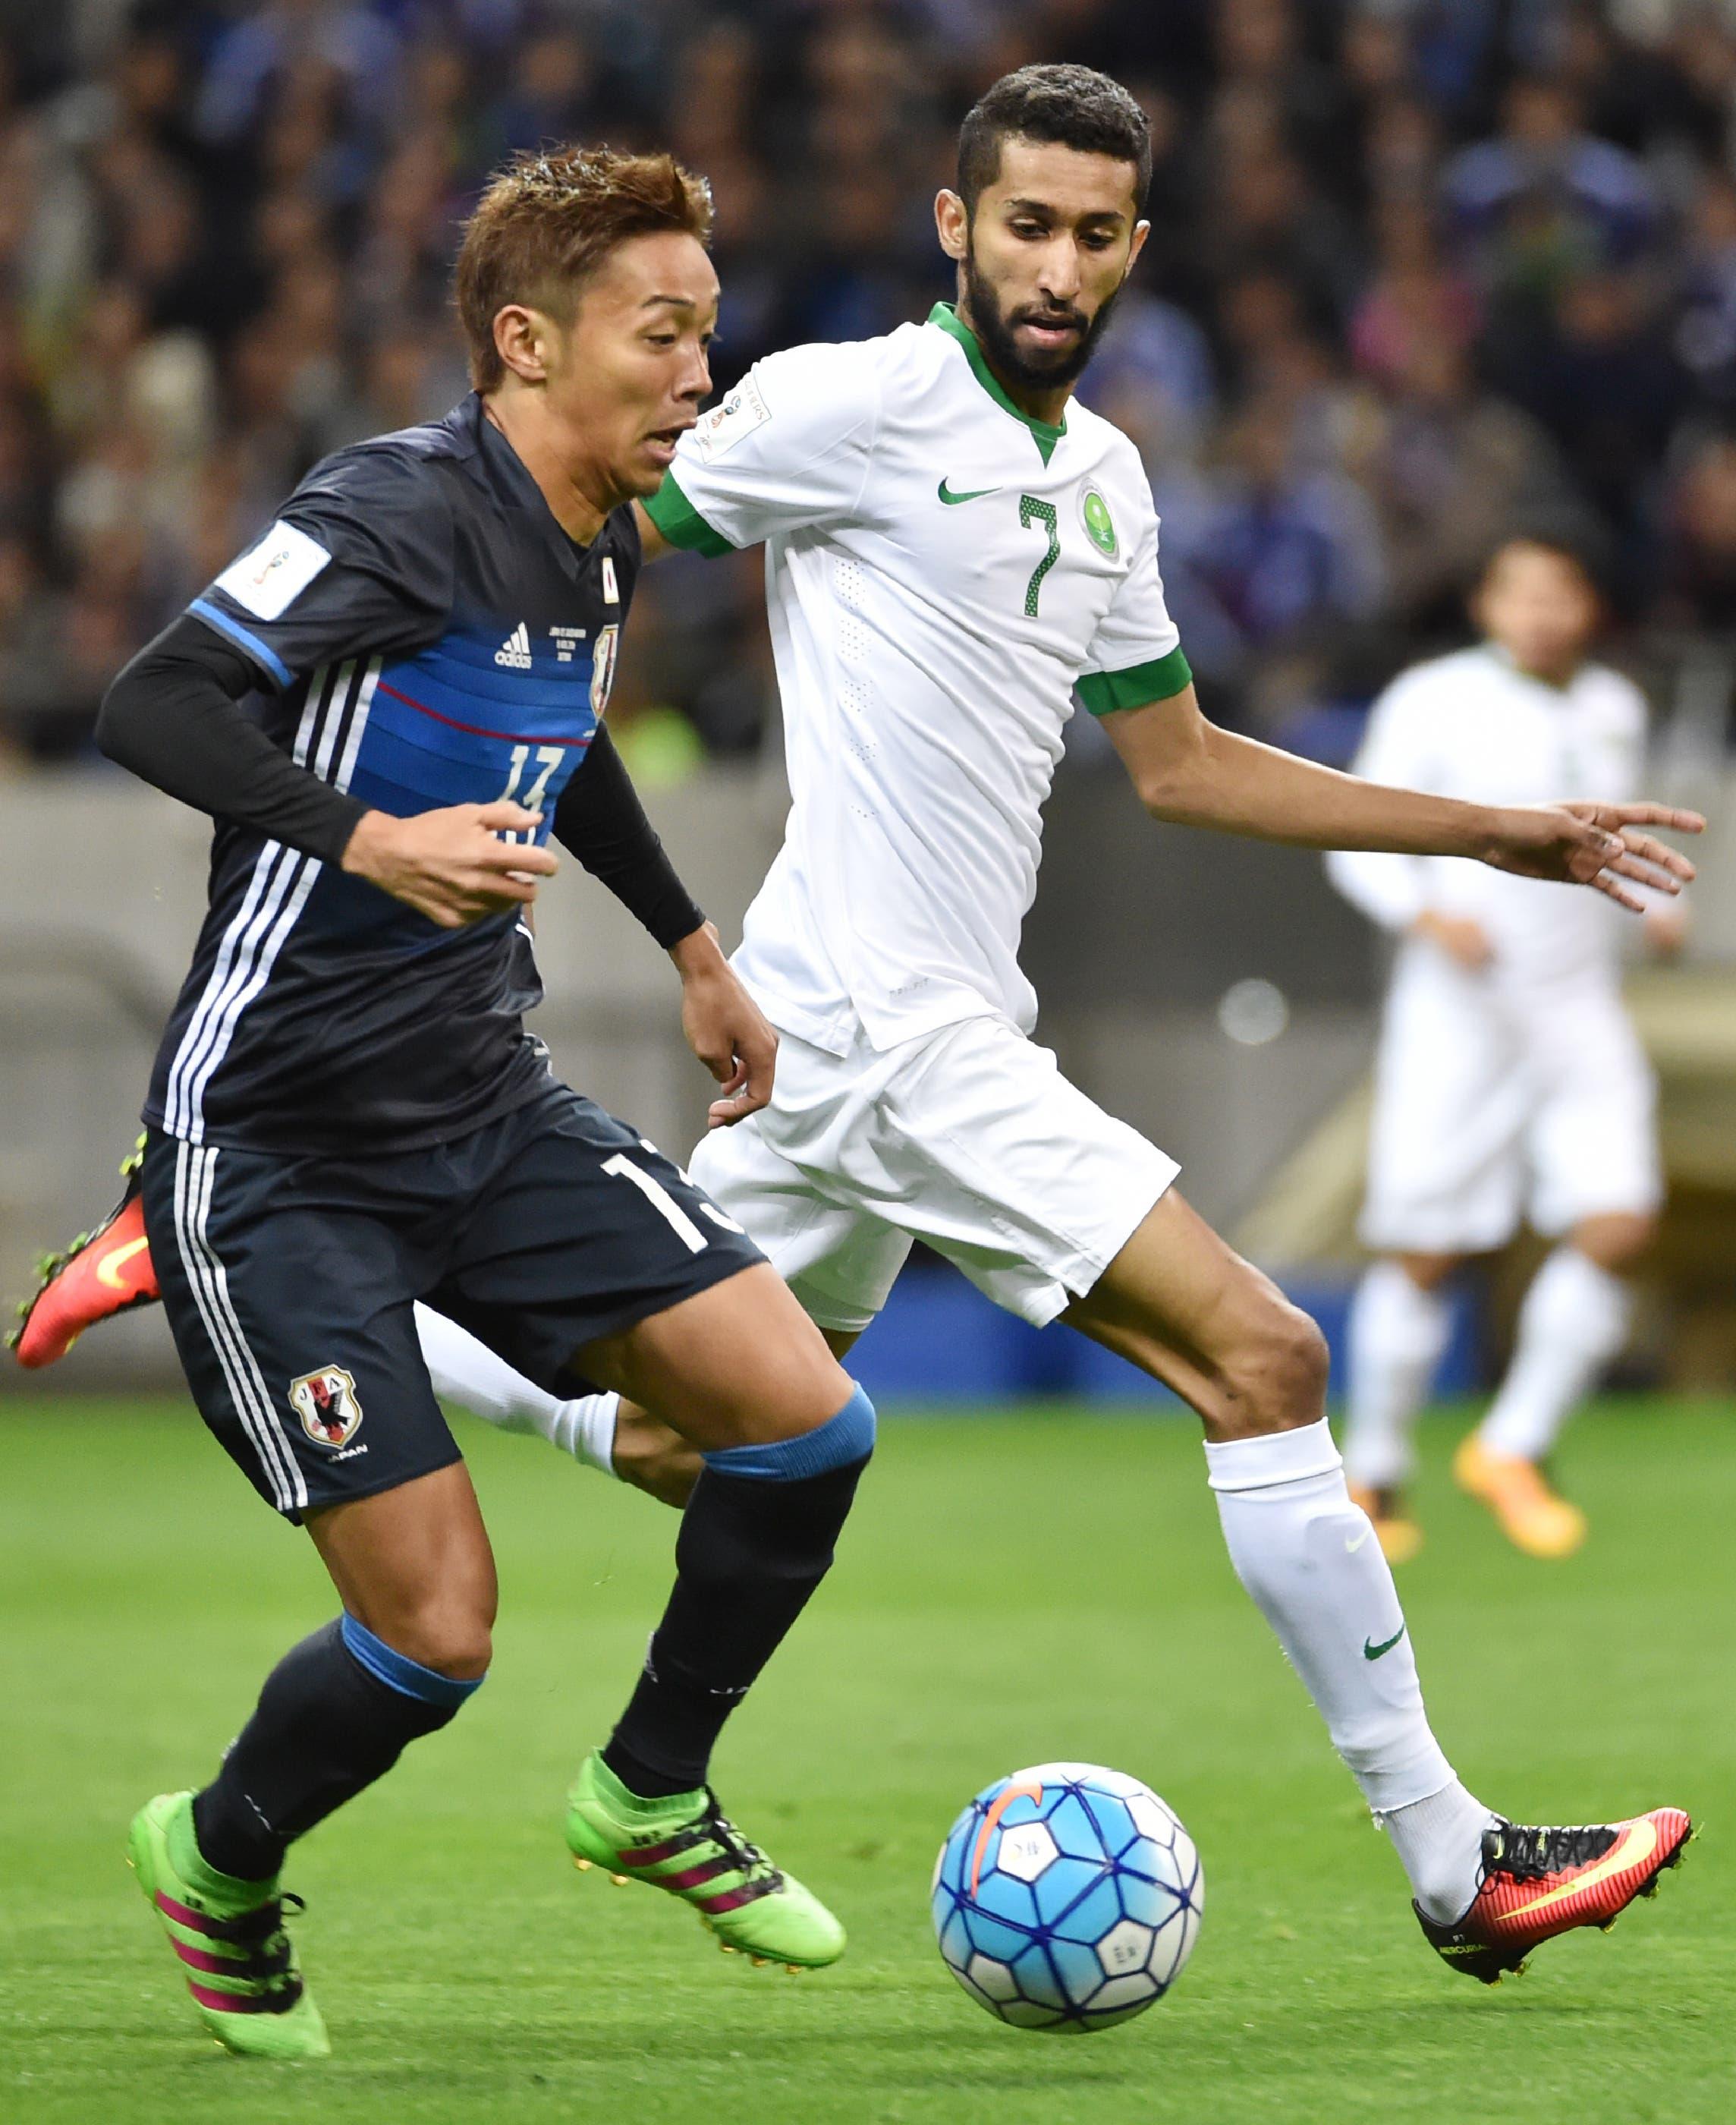 Japan's midfielder Hiroshi Kiyotake (L) and Saudi Arabia's midfielder Salman Alfaraj (R) fight for the ball during their football match in Group B of the 2018 World Cup Asian qualifier at Saitama Stadium in Saitama on November 15, 2016.  KAZUHIRO NOGI / AFP